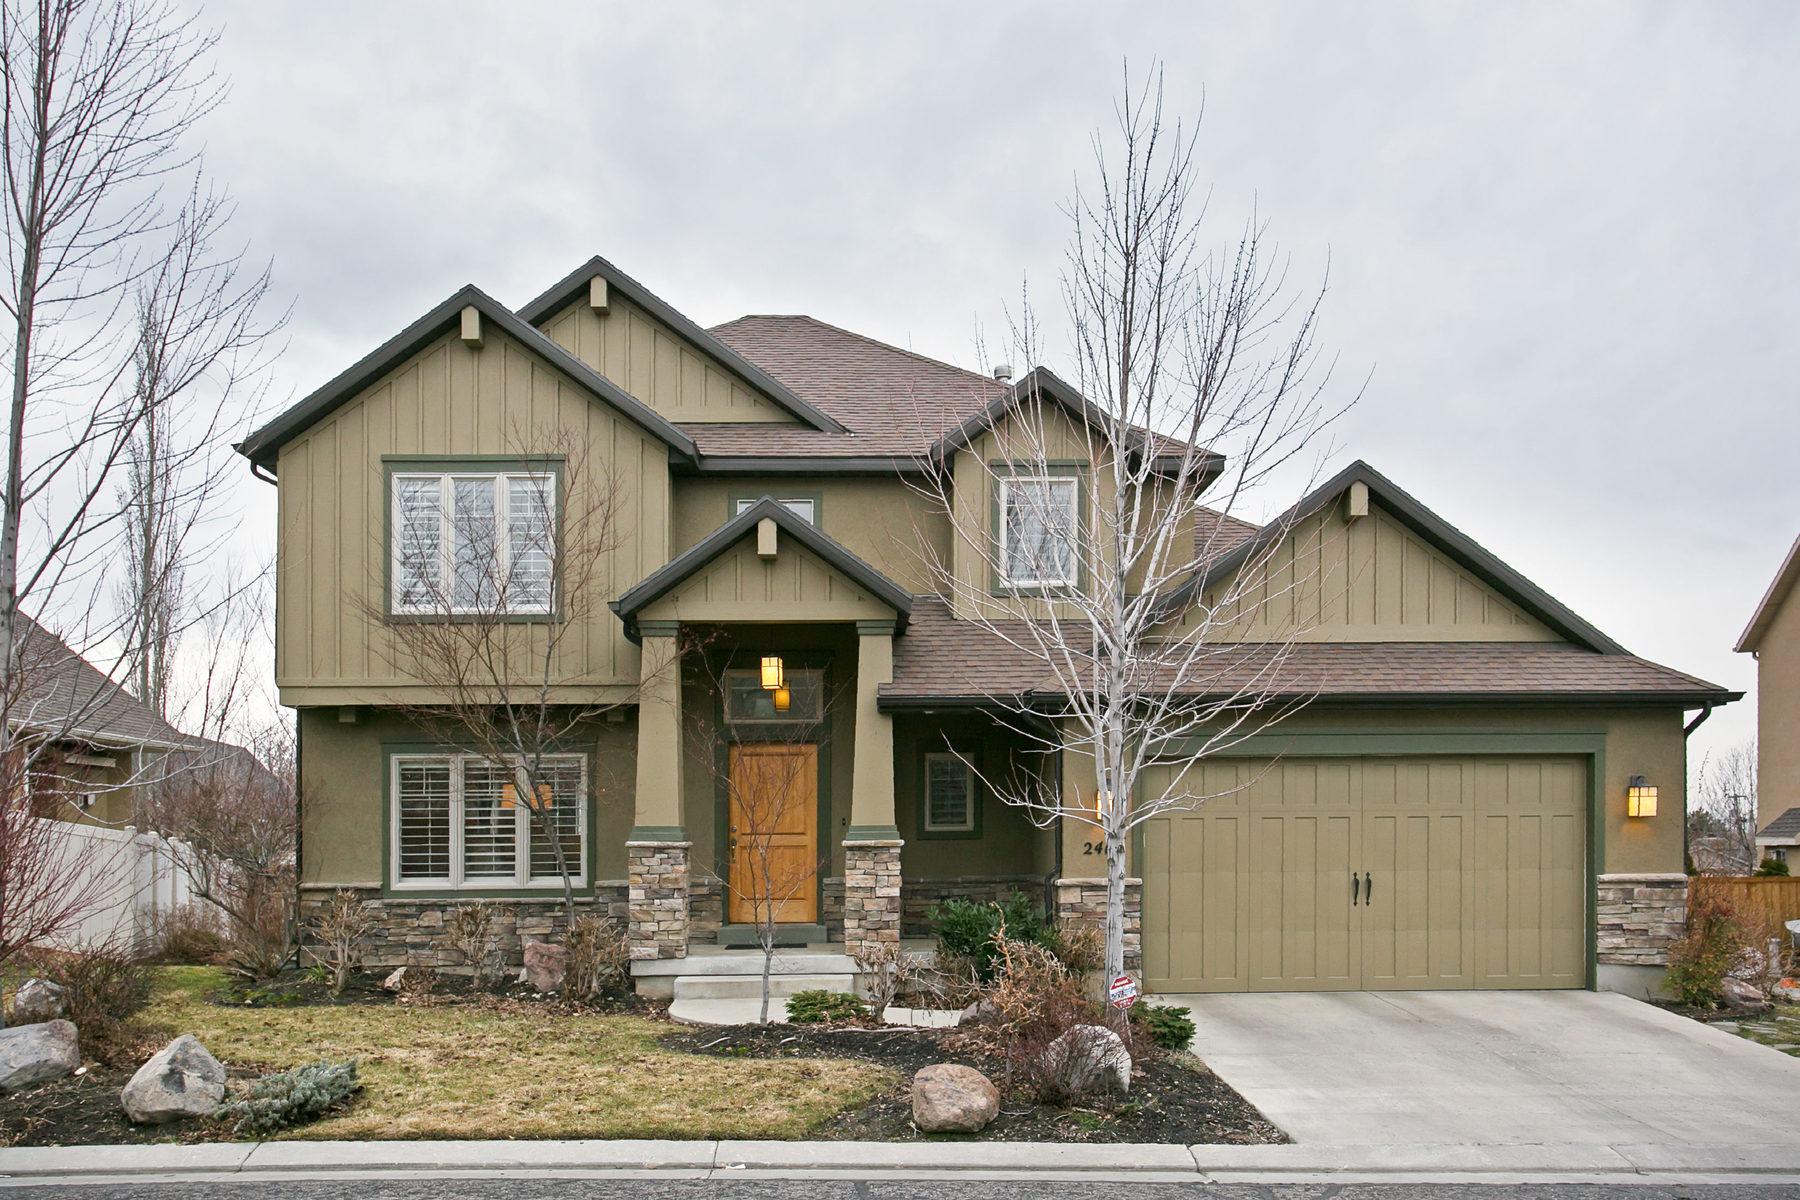 獨棟家庭住宅 為 出售 在 Beautiful East Millcreek Two-Story 2418 E Woodwillow Cir Salt Lake City, 猶他州, 84109 美國